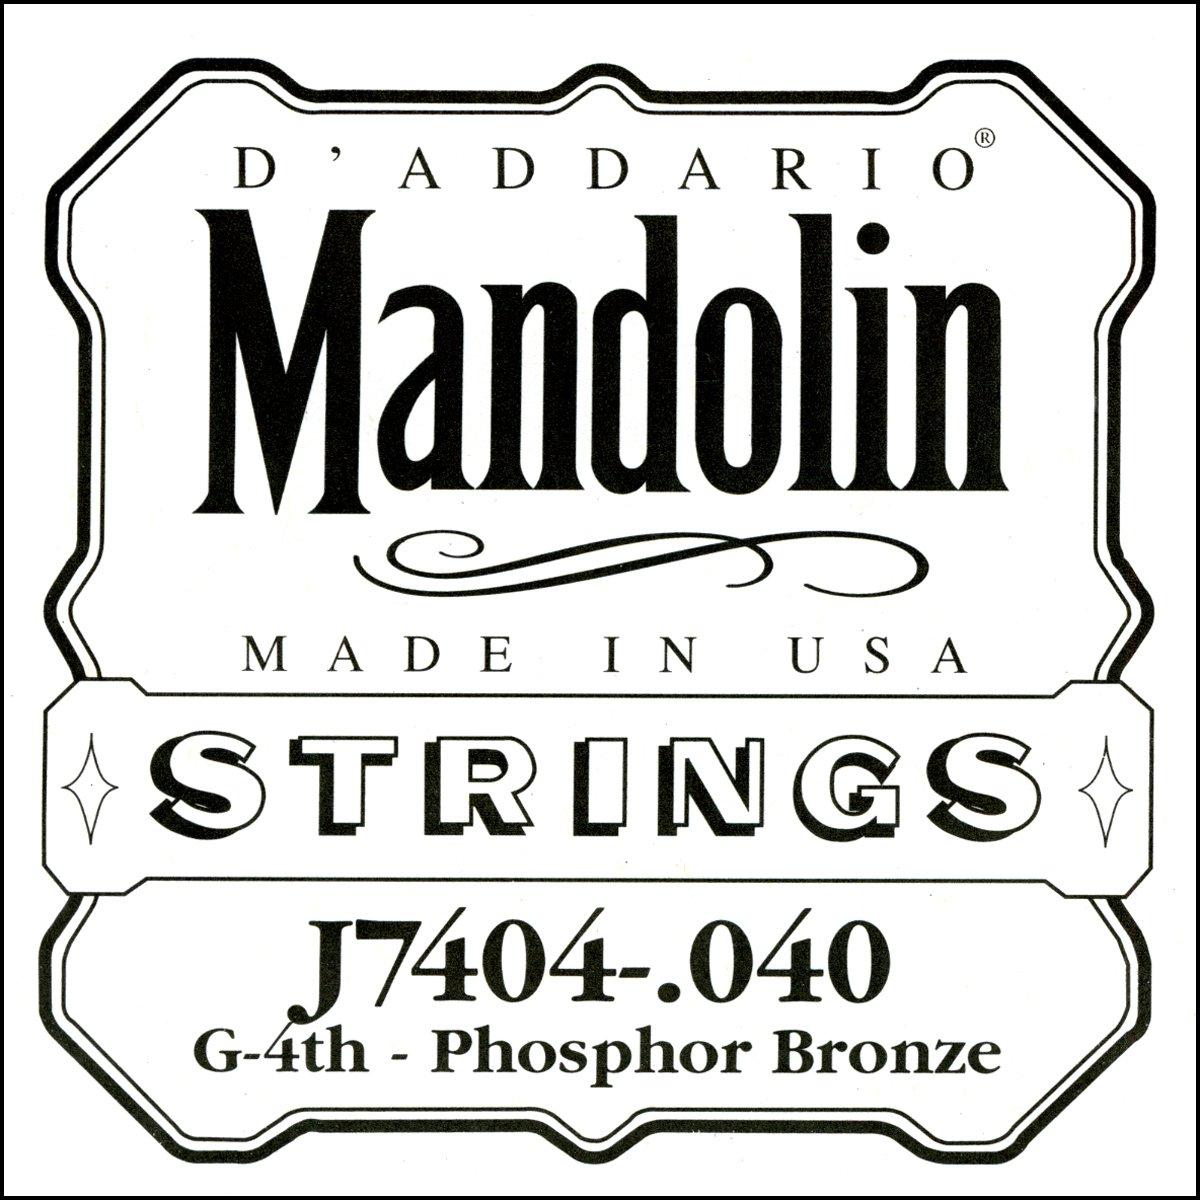 D'Addario J7404 Phosphor Bronze Mandolin Single String, Fourth String, .040 D'Addario